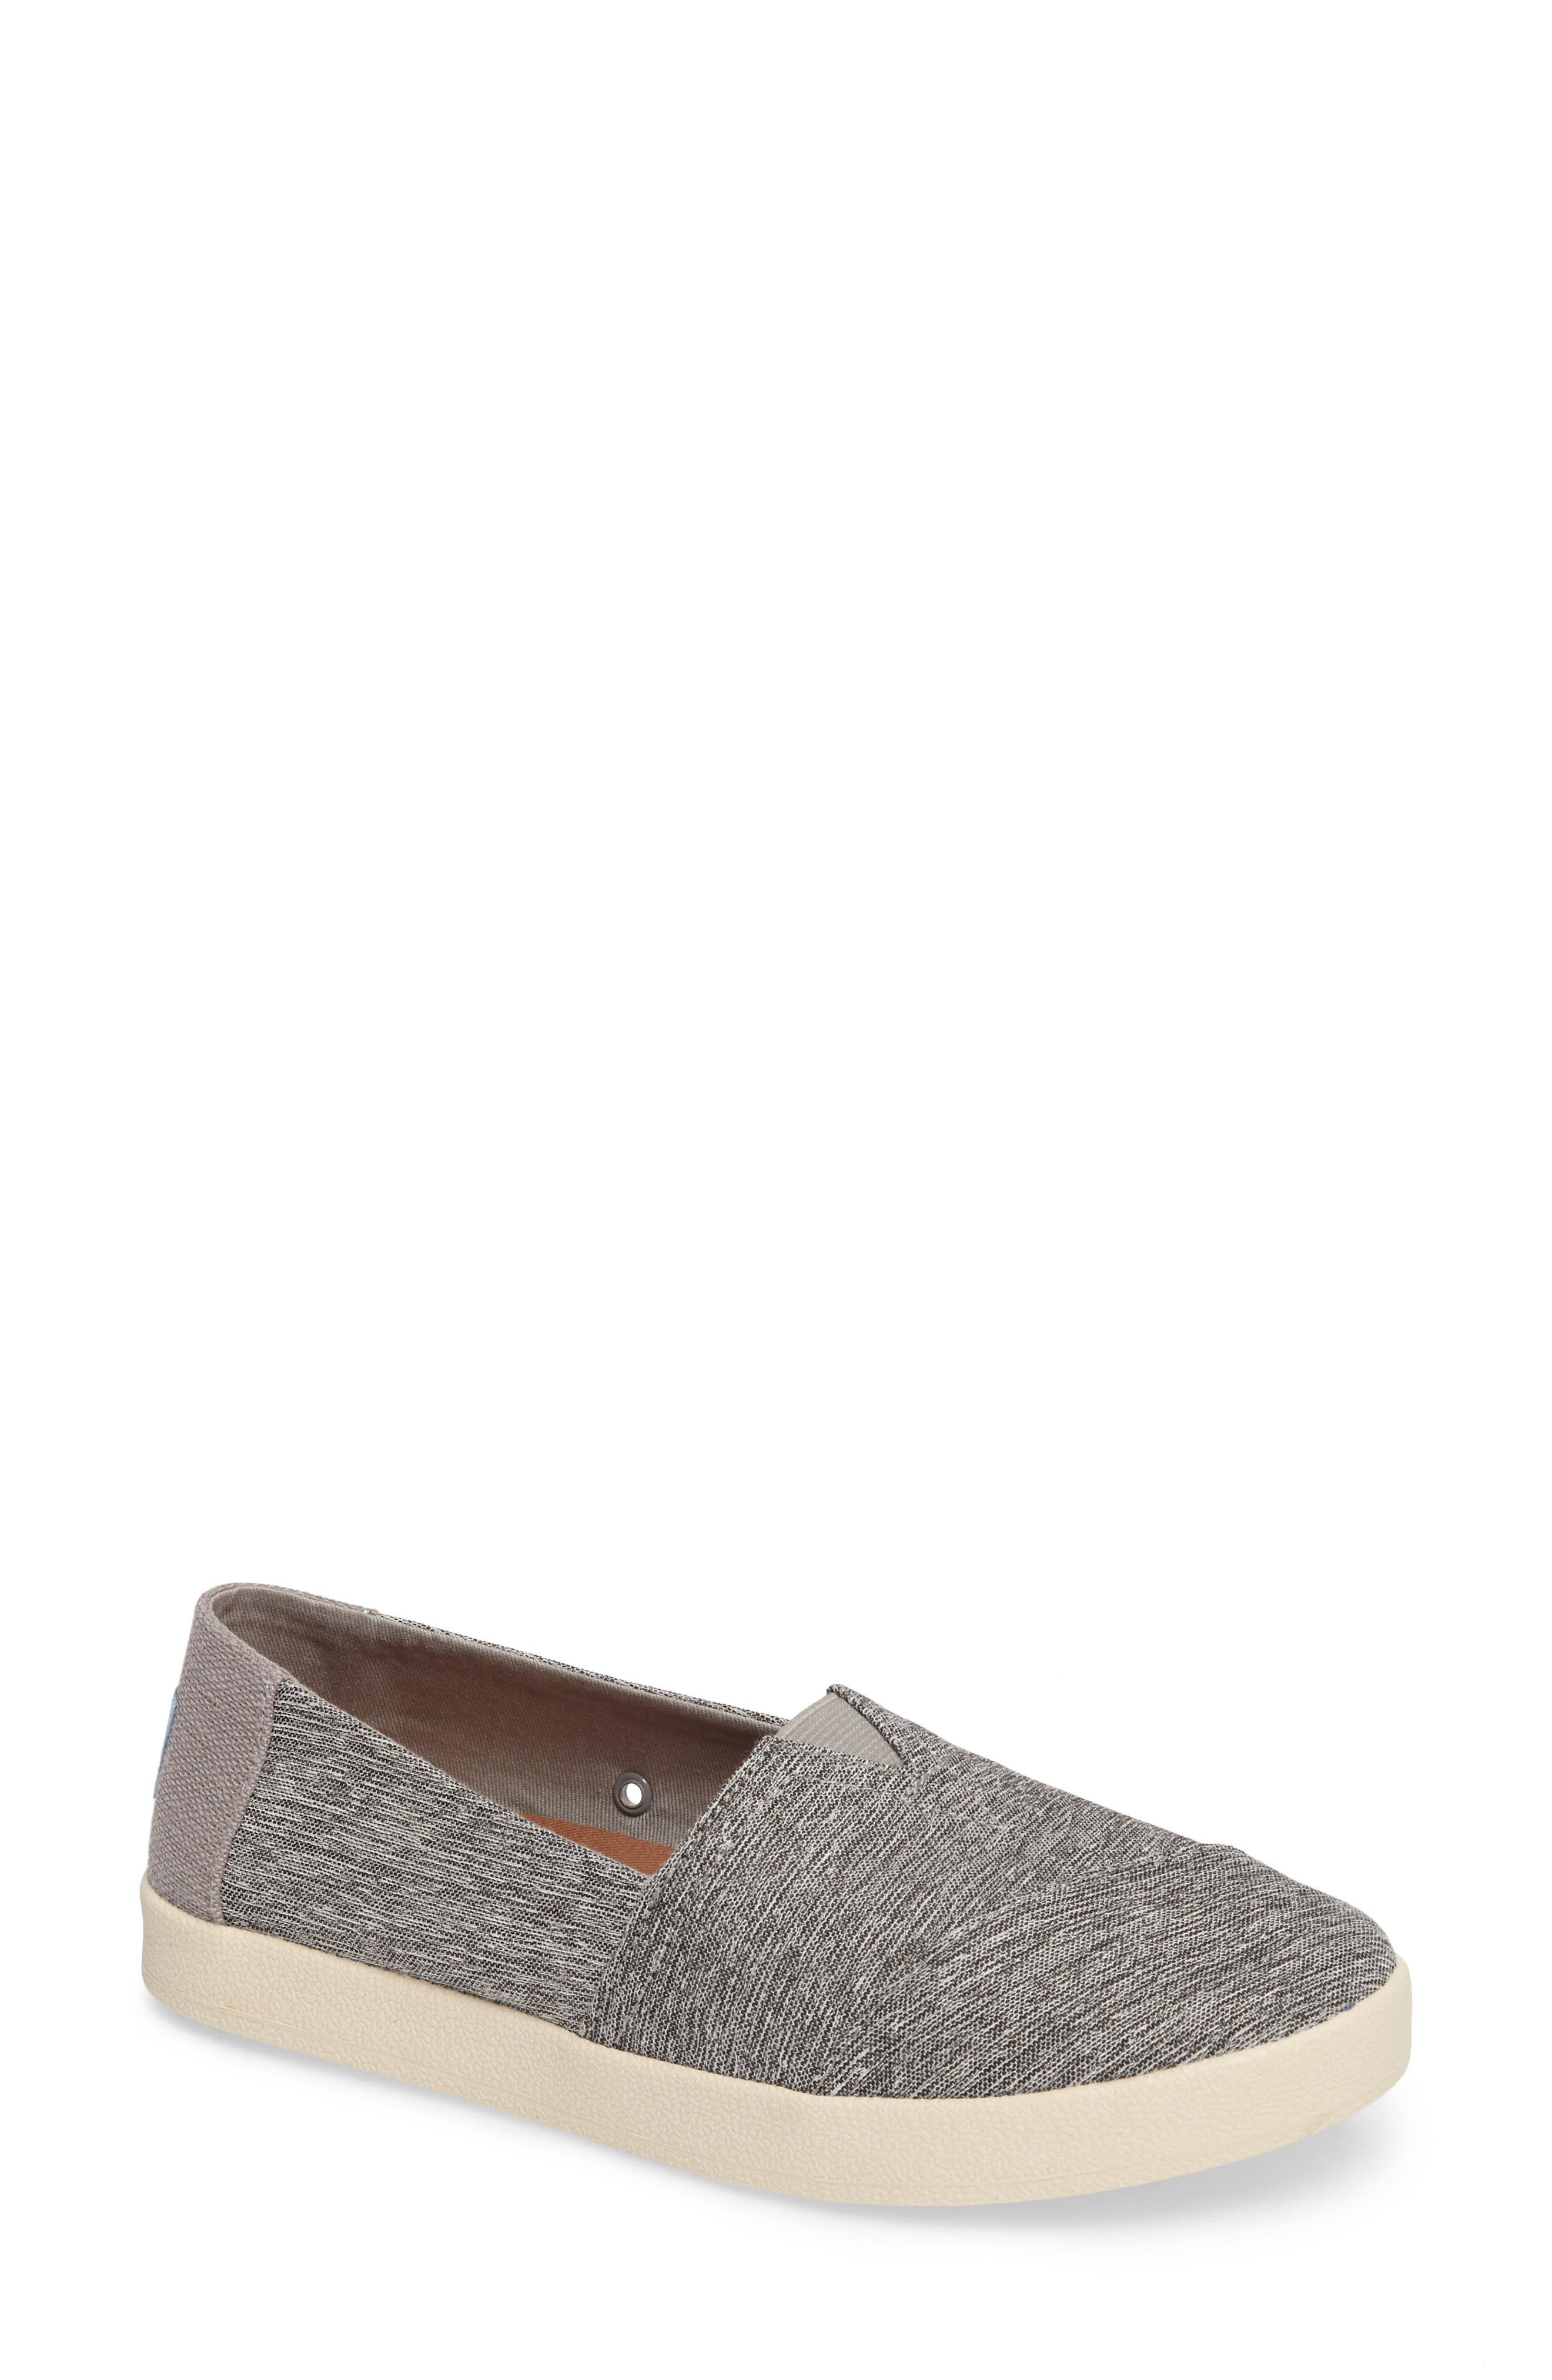 Avalon Slip-On,                         Main,                         color, Forged Iron Grey